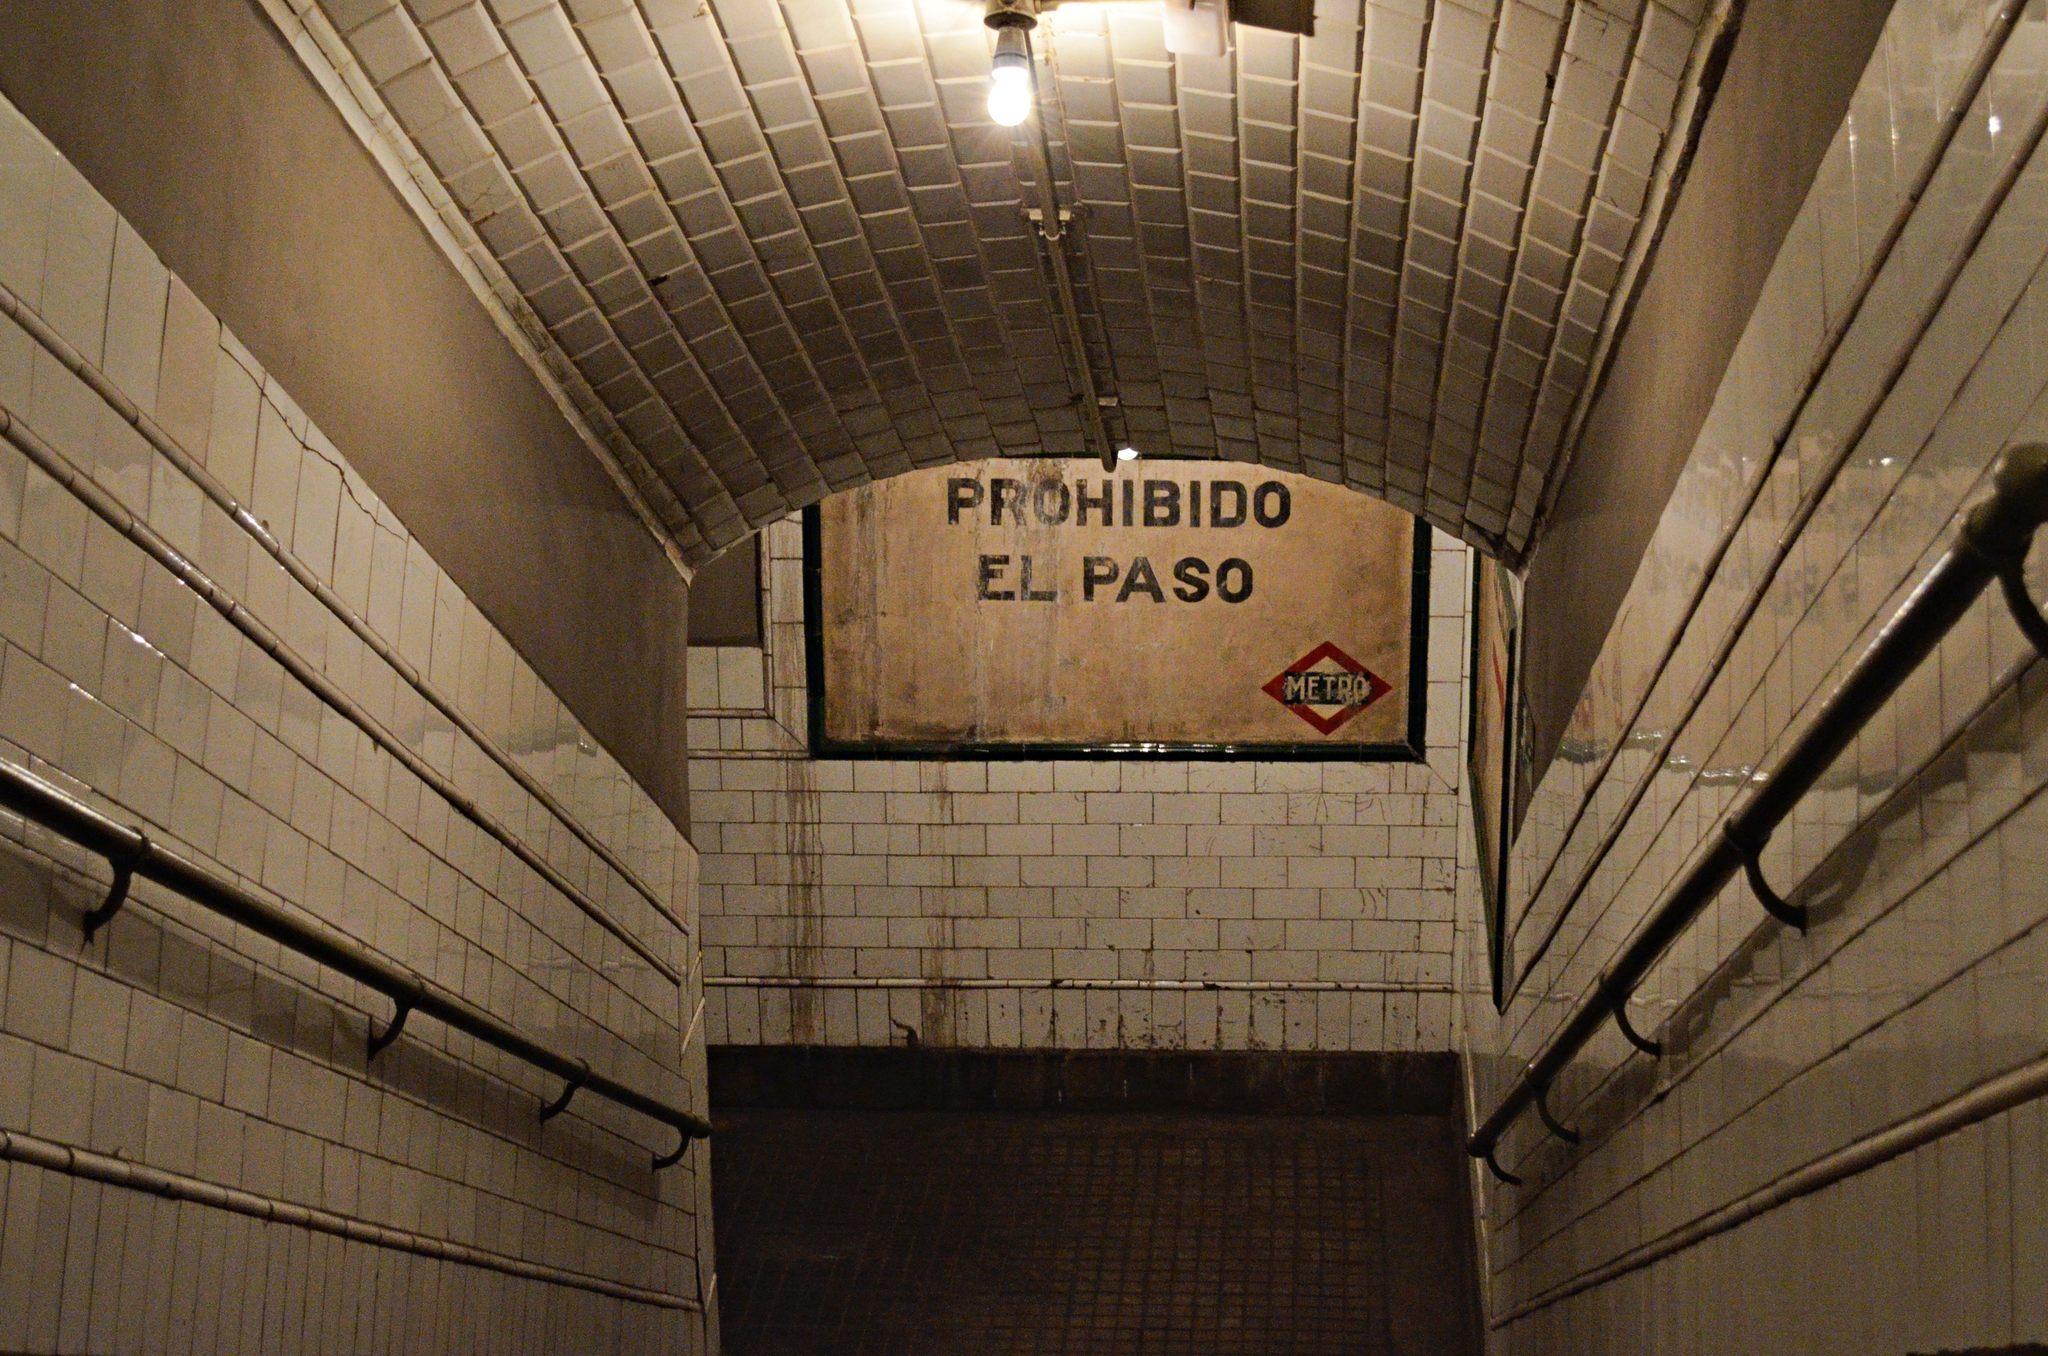 anden0_chamberi_metro_madrid_1_claudiapaiva-Resize